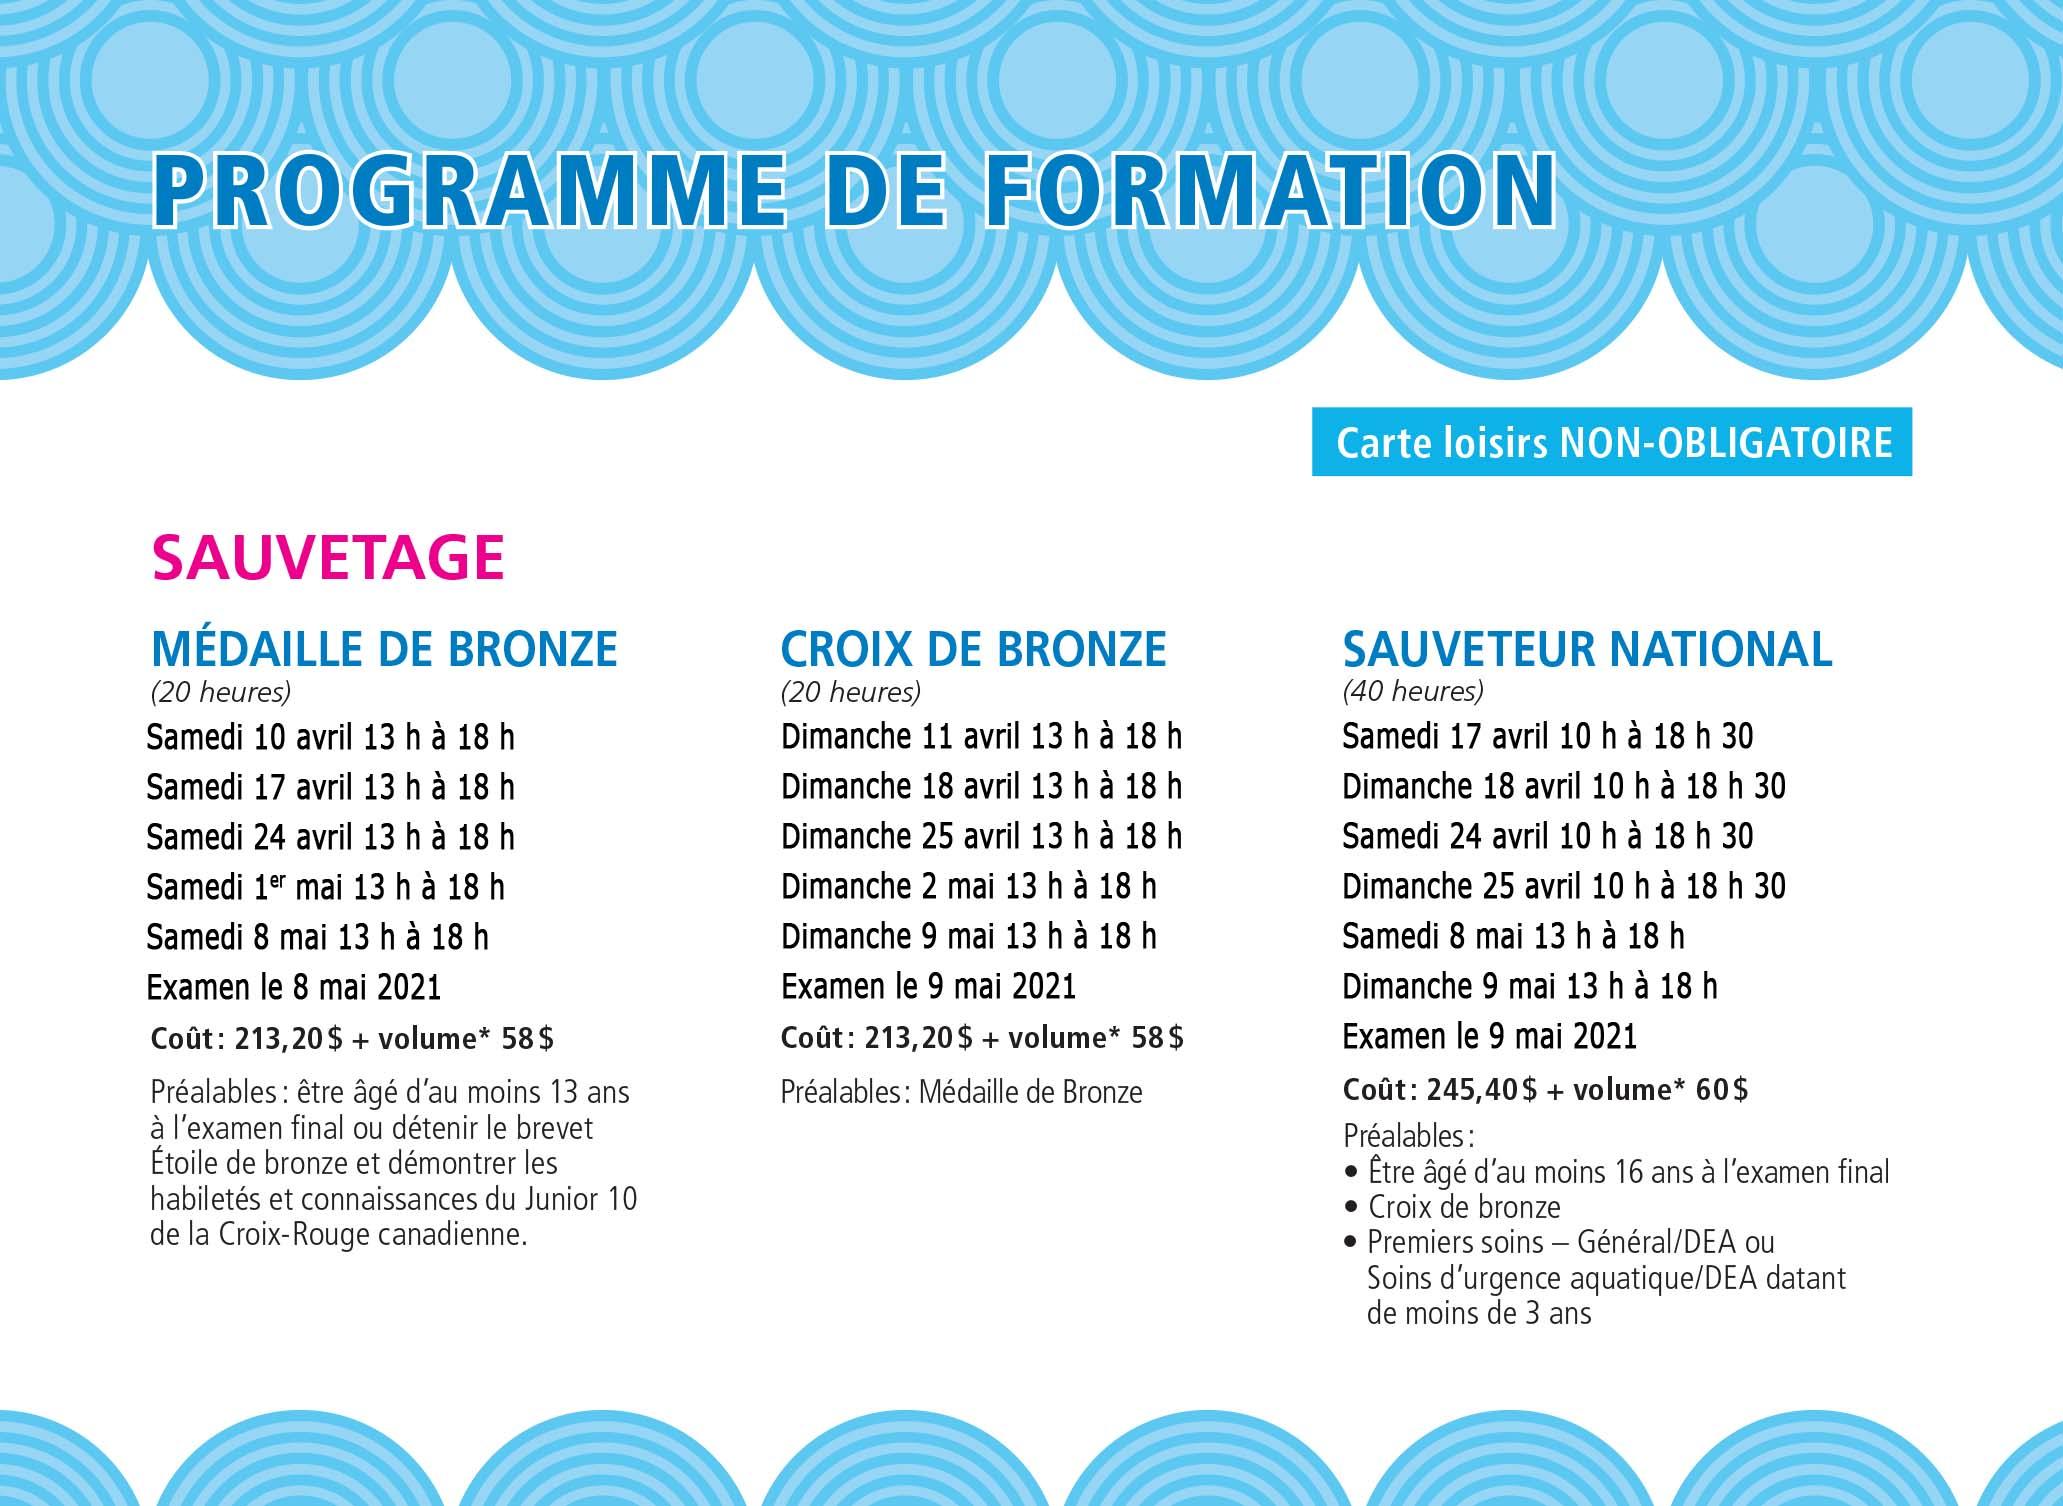 2021-03-24_programme_de_formation.jpg (327 KB)